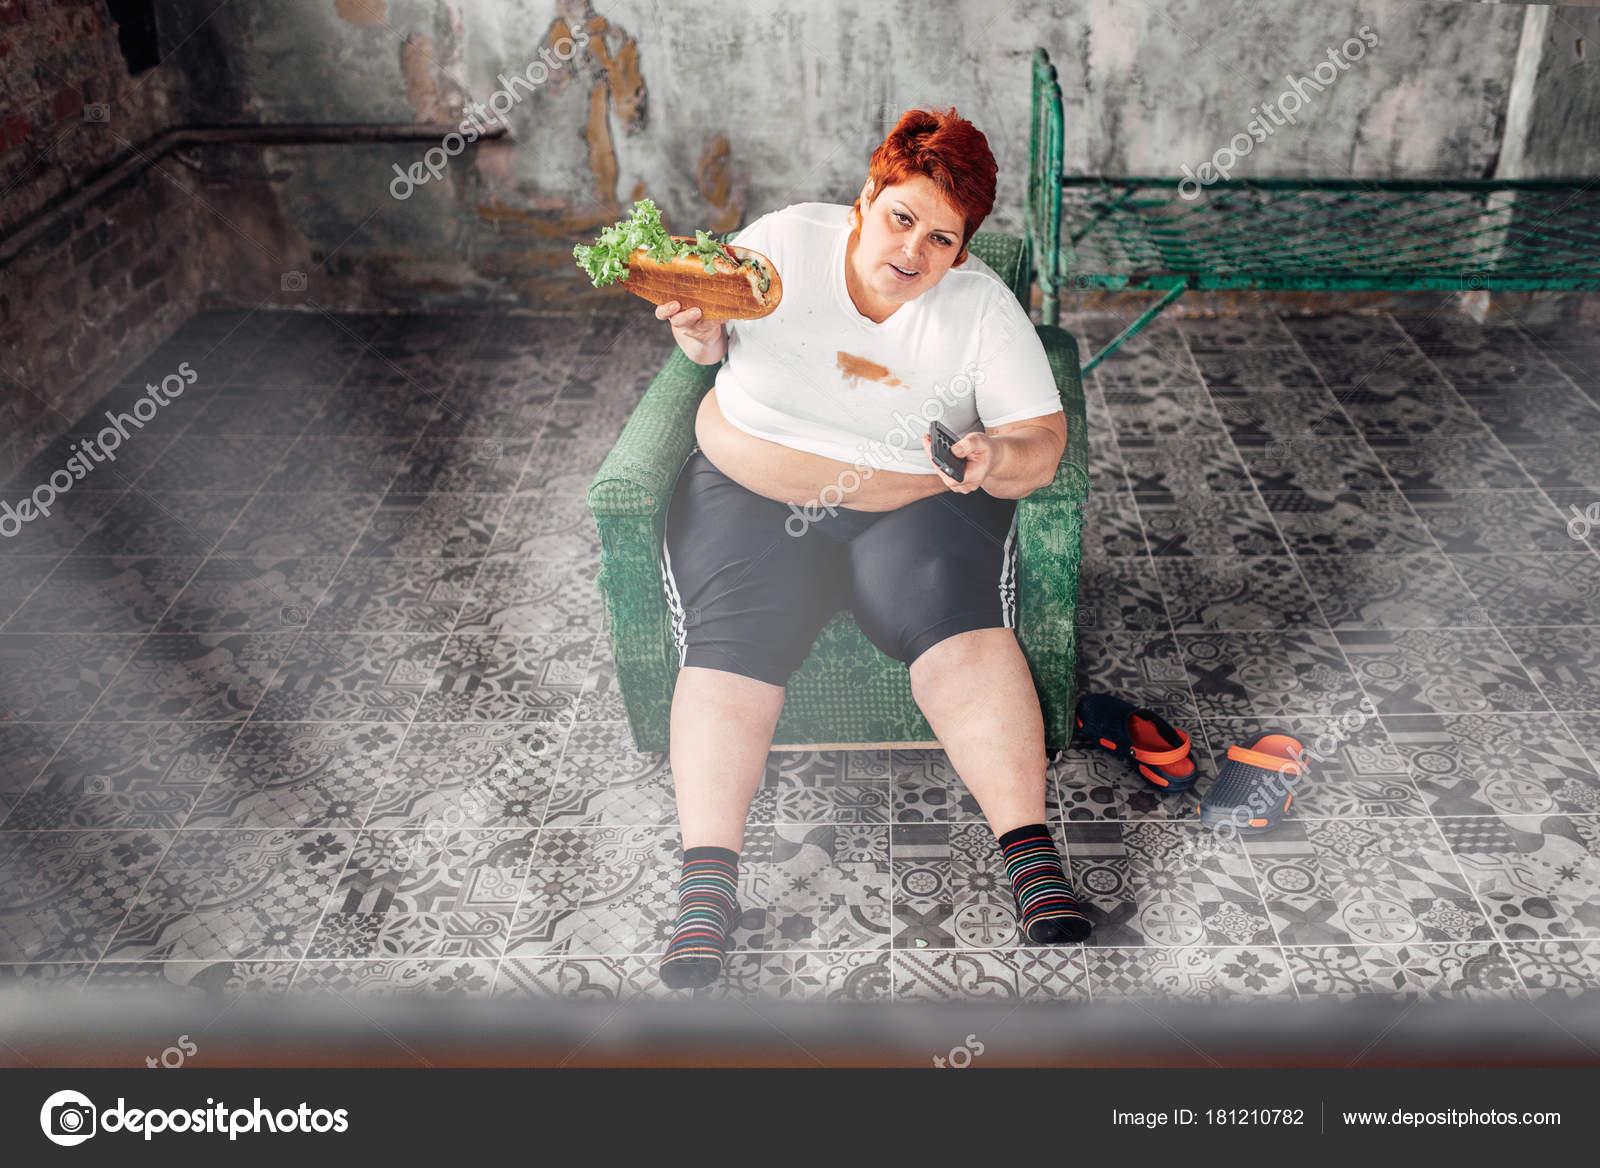 meet attractive single Super sexy Arschporno curvy all the